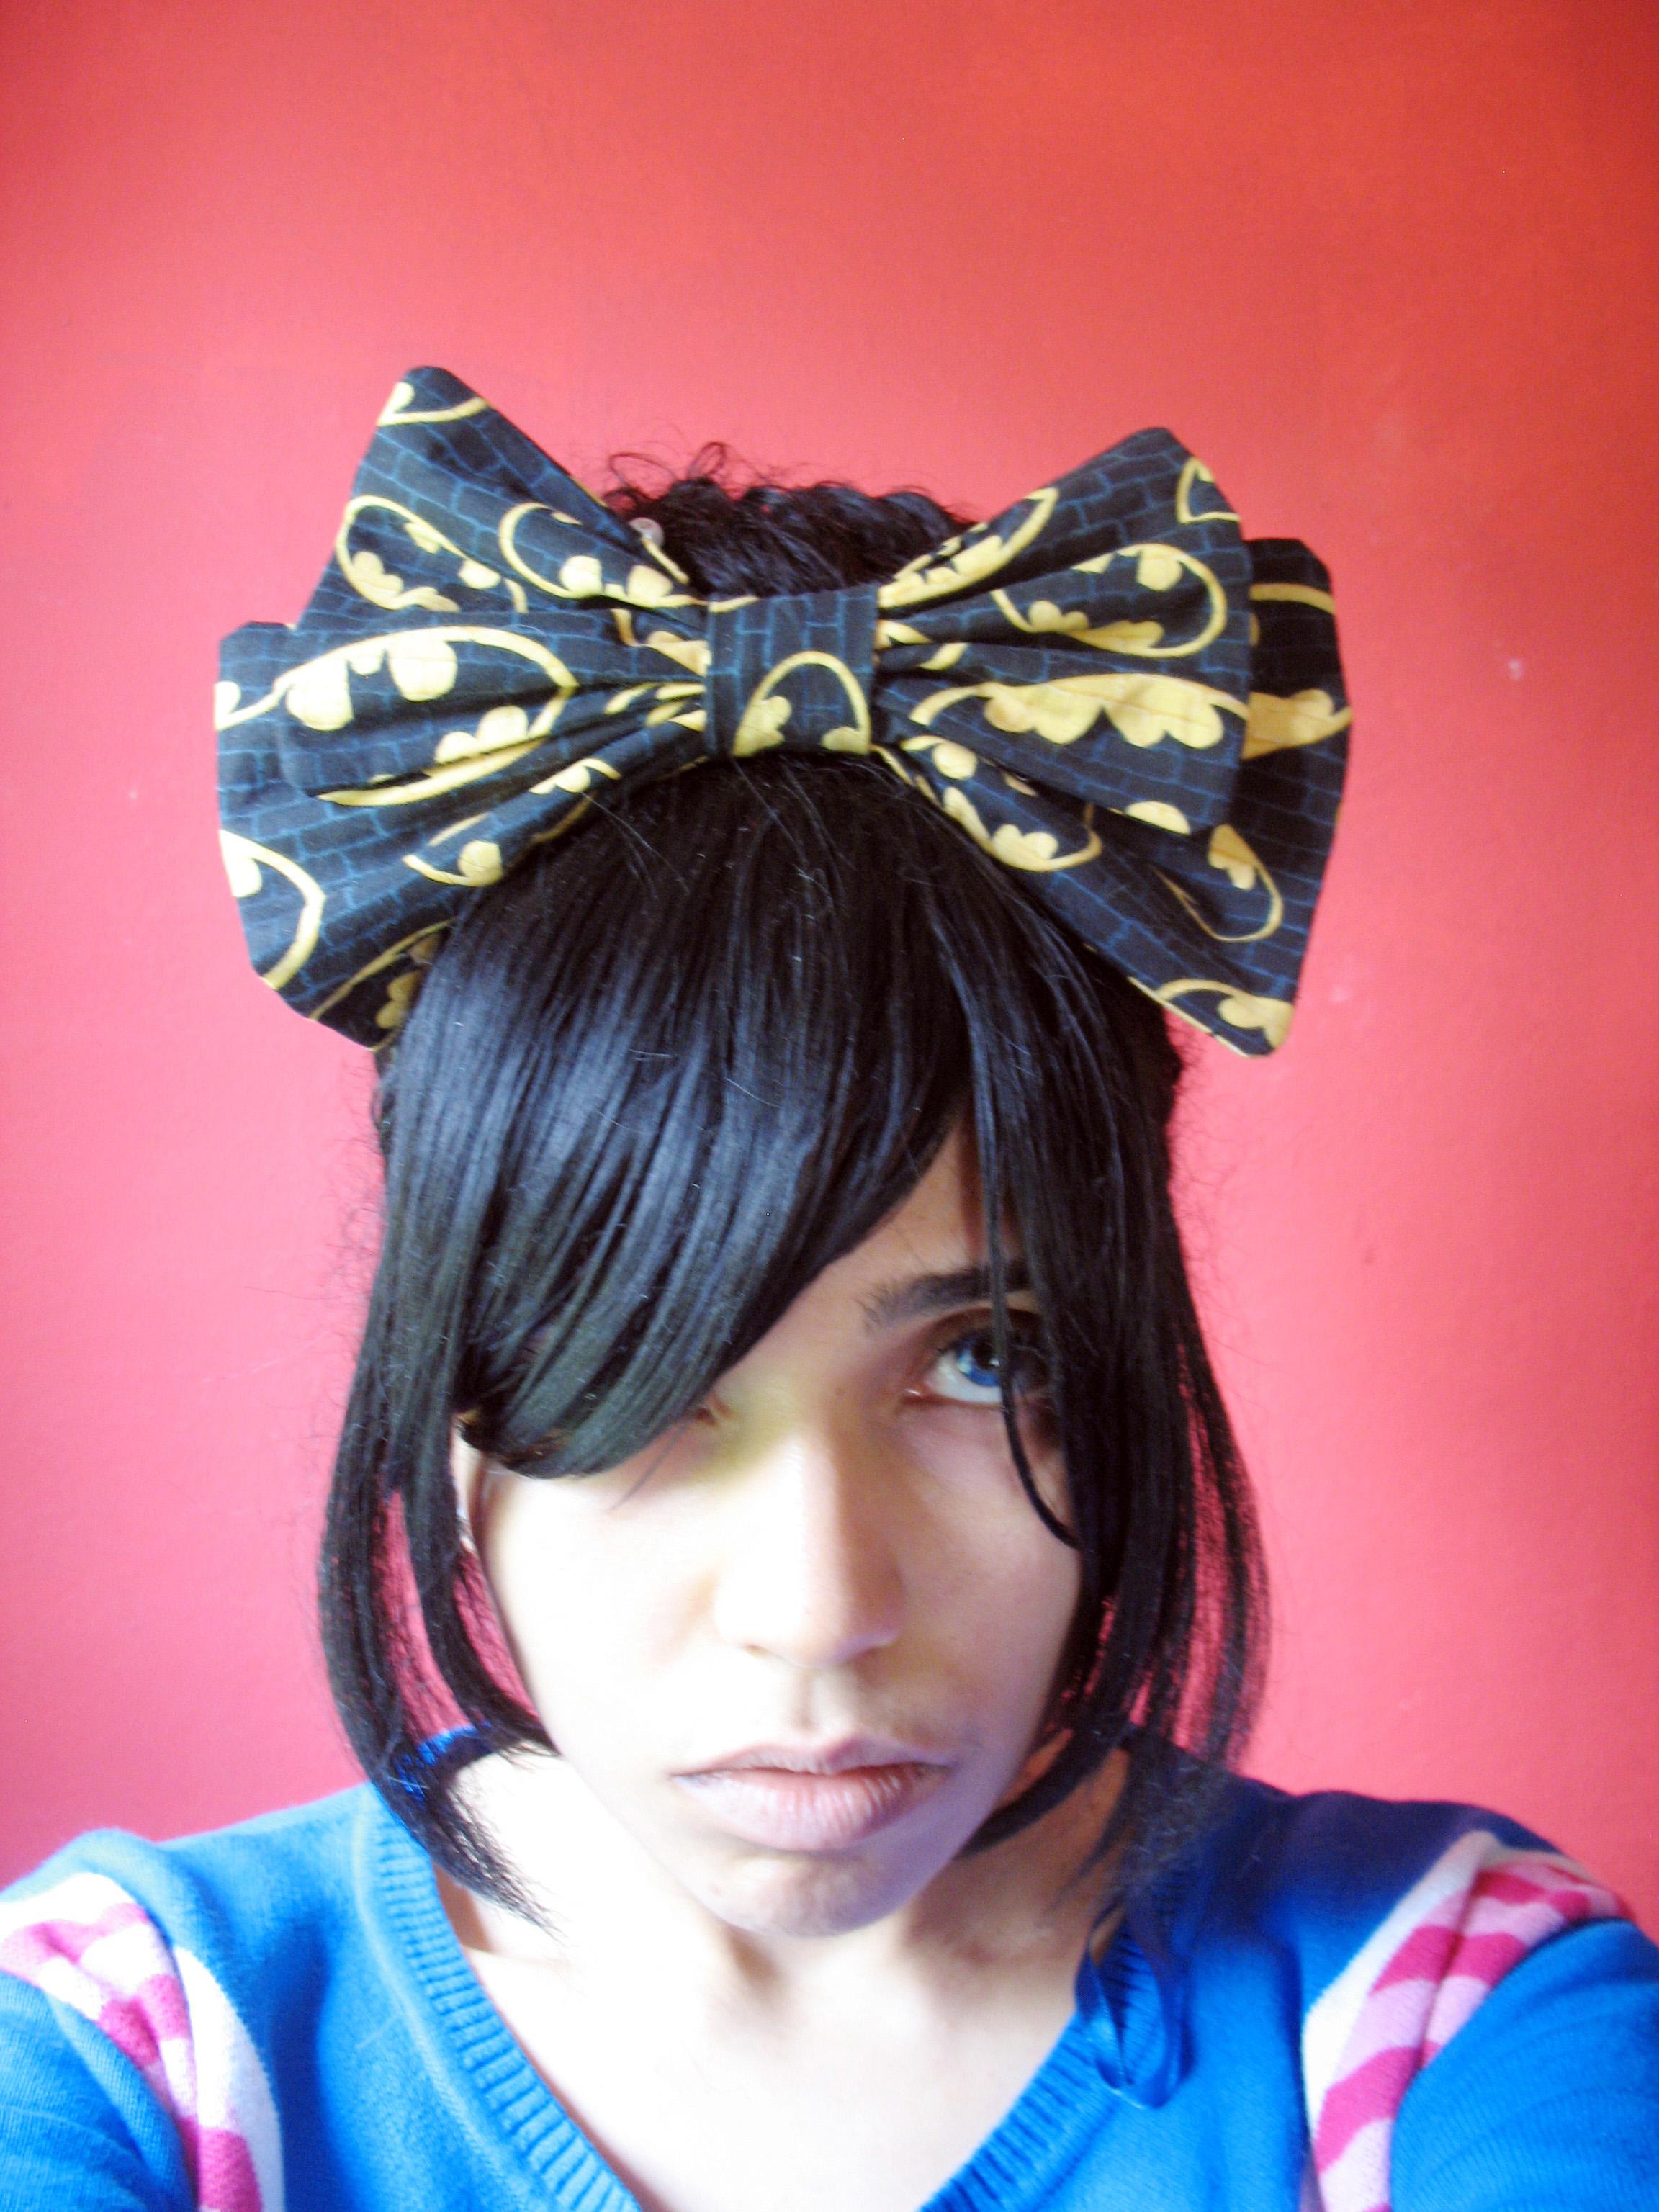 Lolita style batman hair bow headband